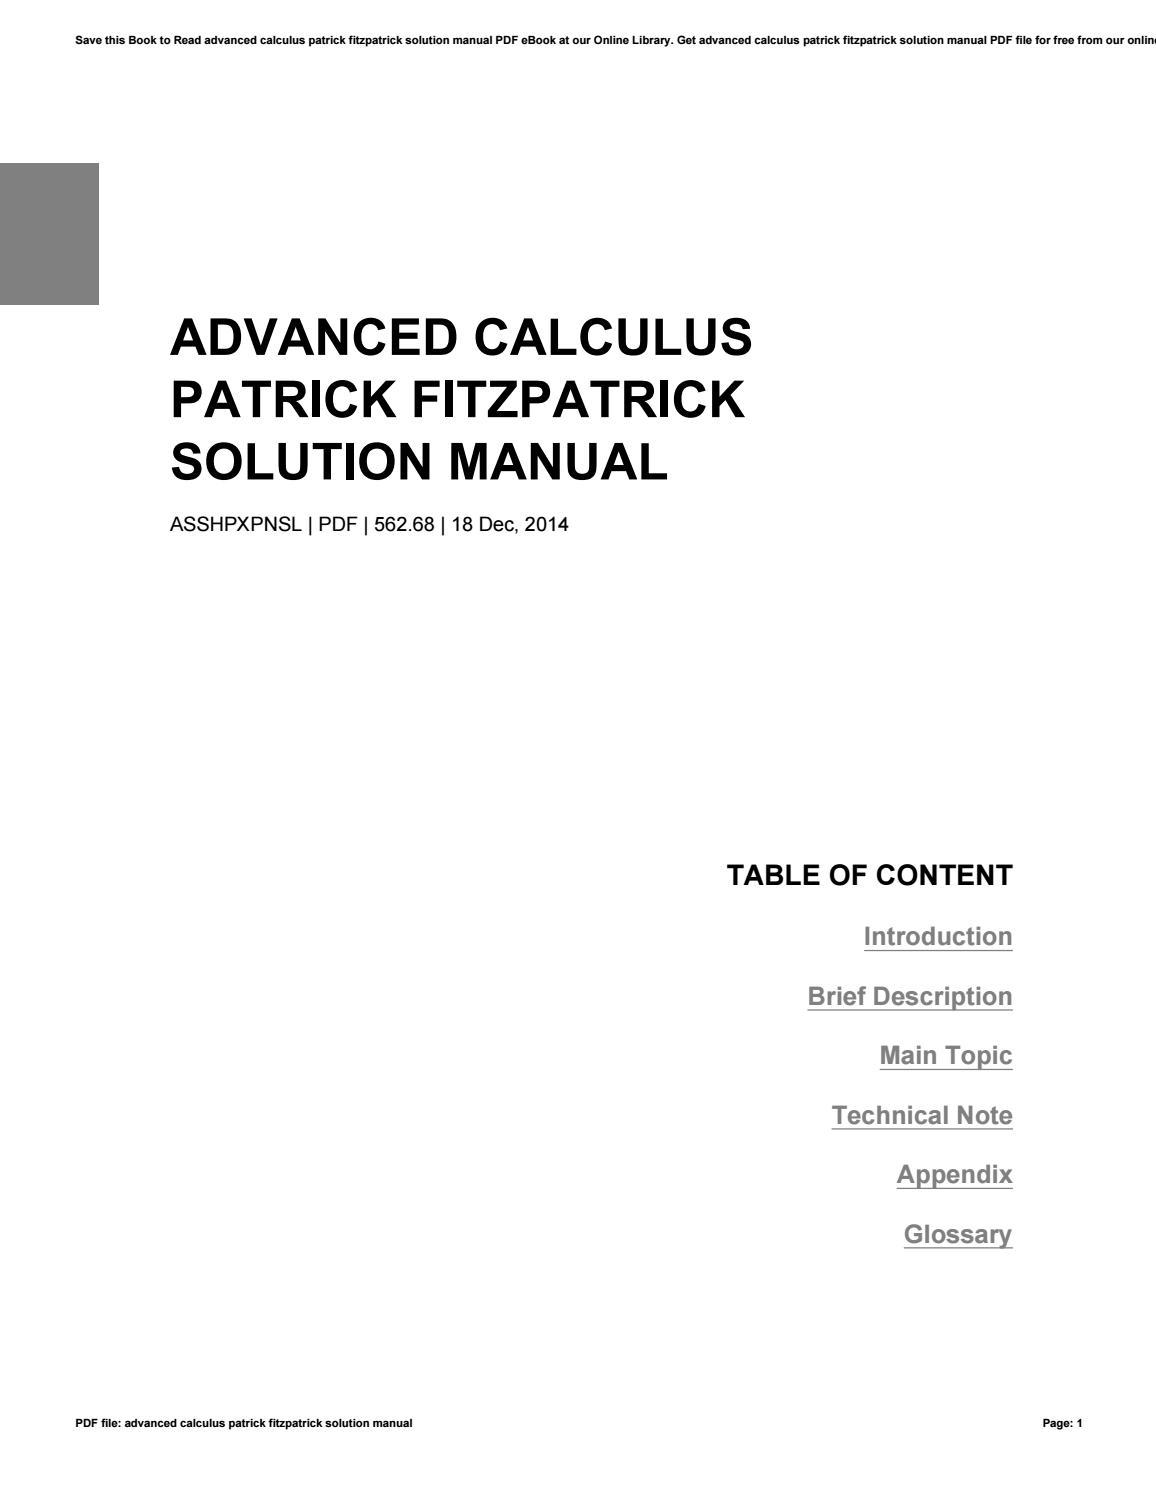 Advanced Calculus Patrick Fitzpatrick Solution Manual By Leonardcharles908 Issuu